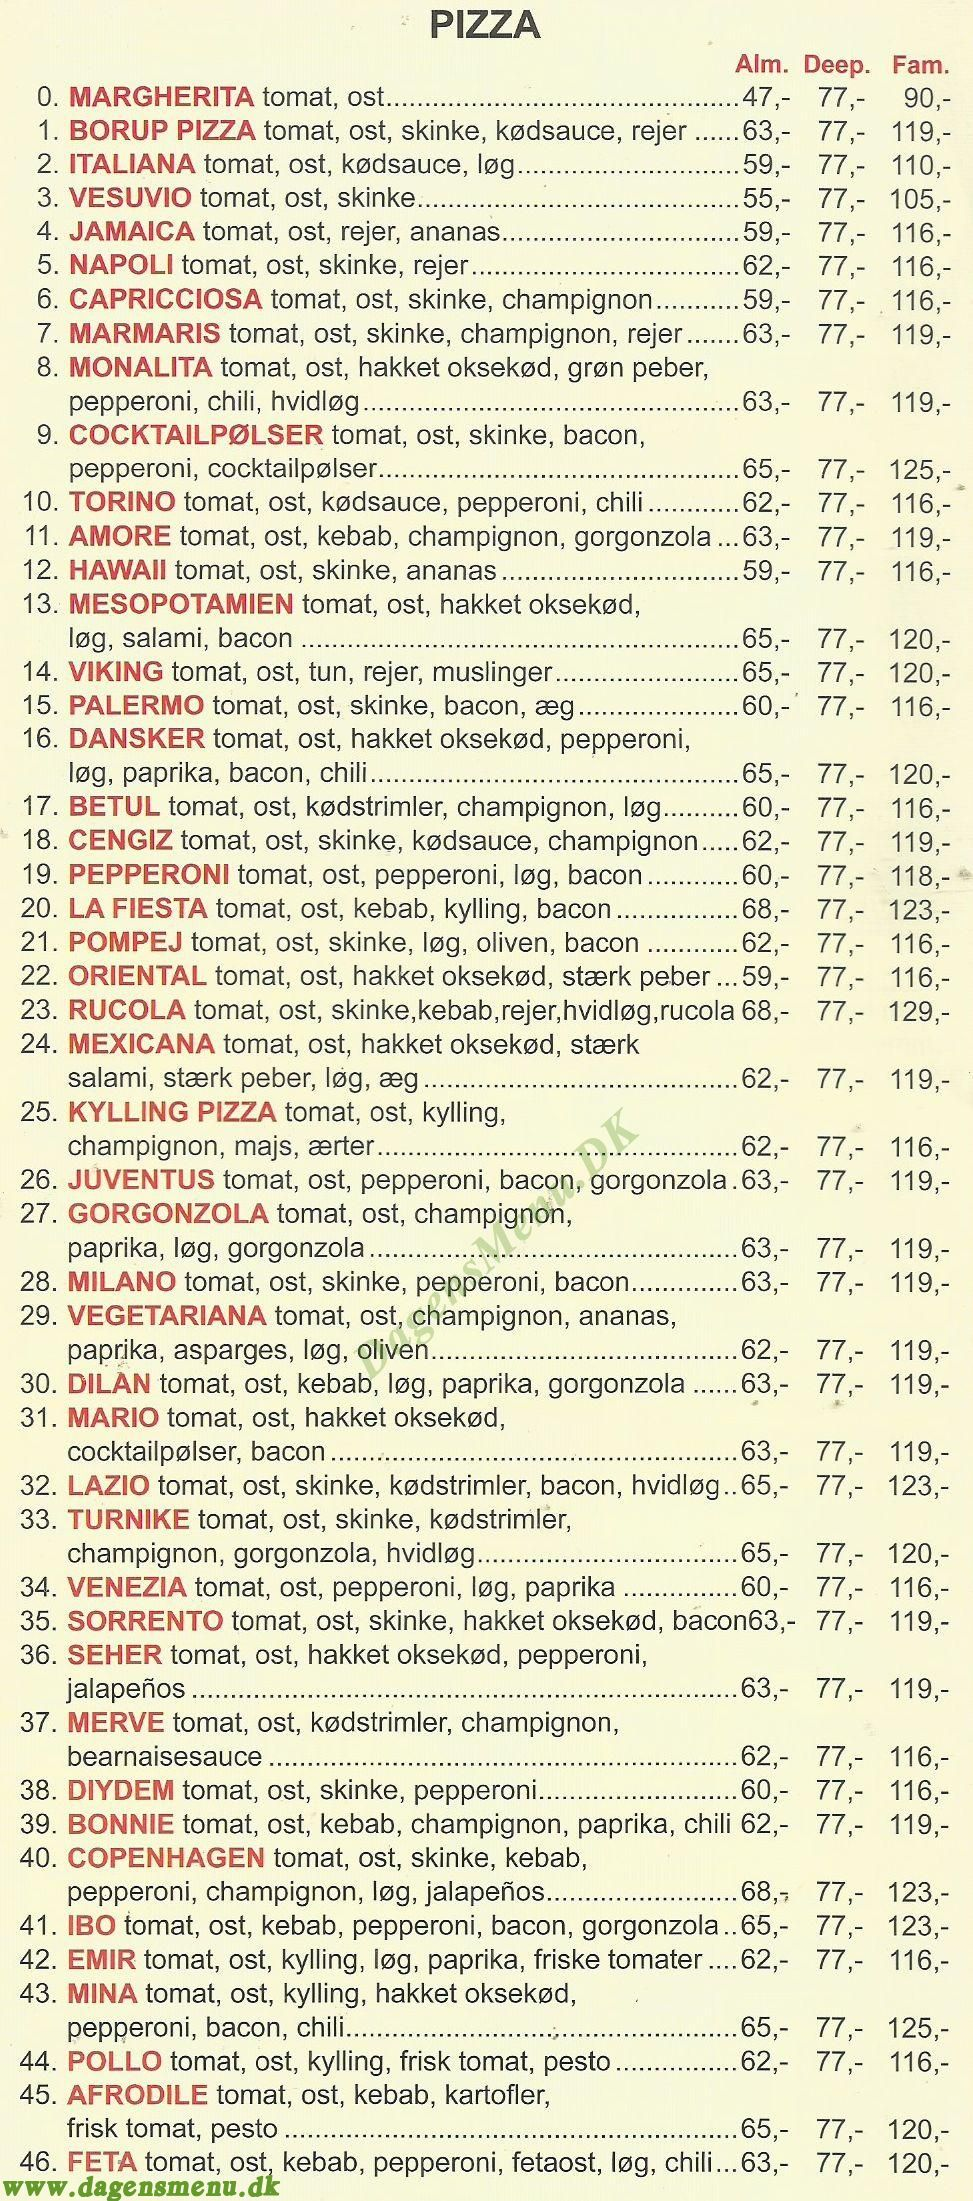 Borup Restaurant & Pizza - Menukort